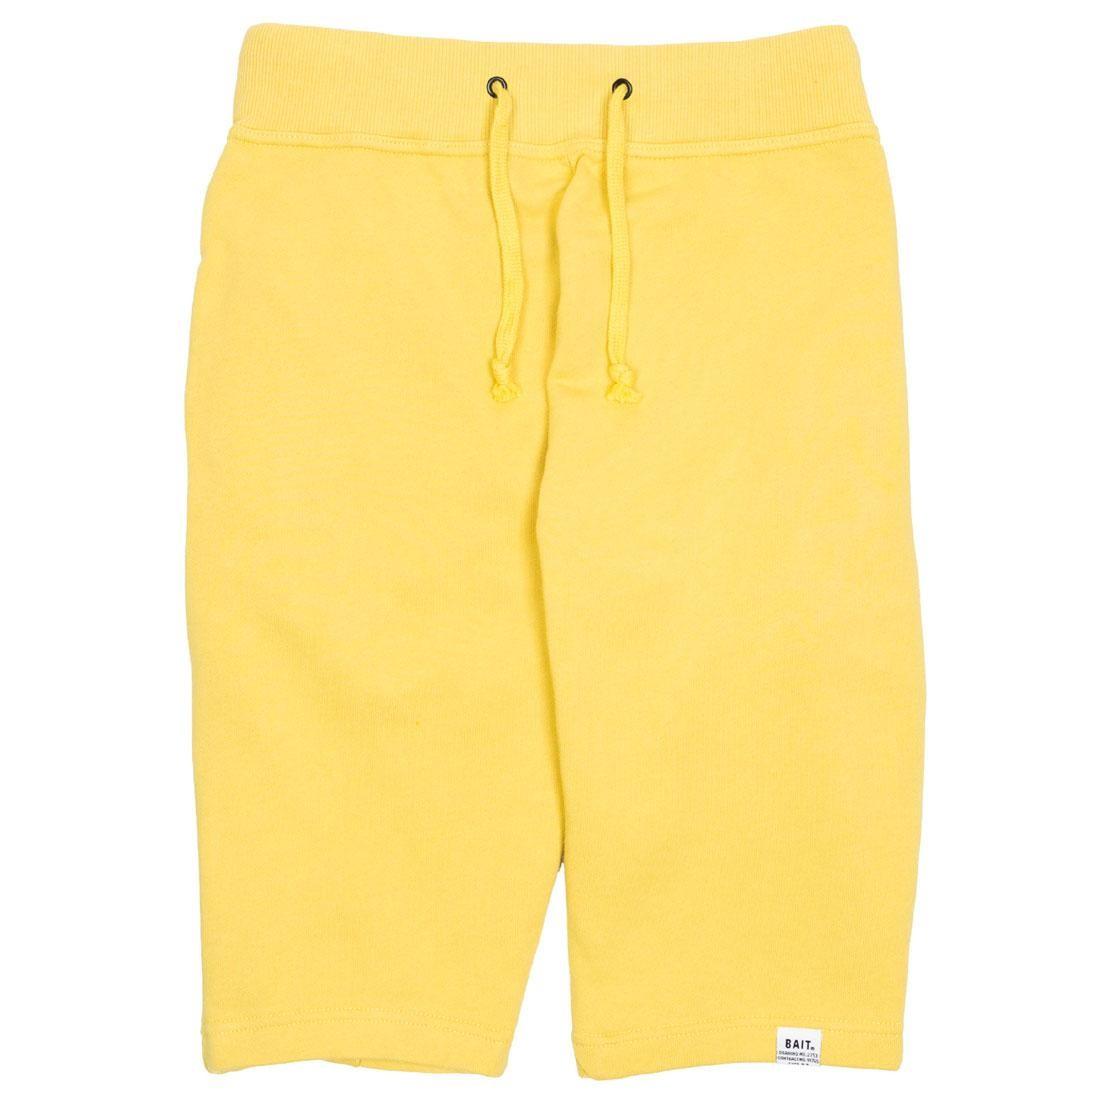 BAIT Men Sweat Shorts (yellow)